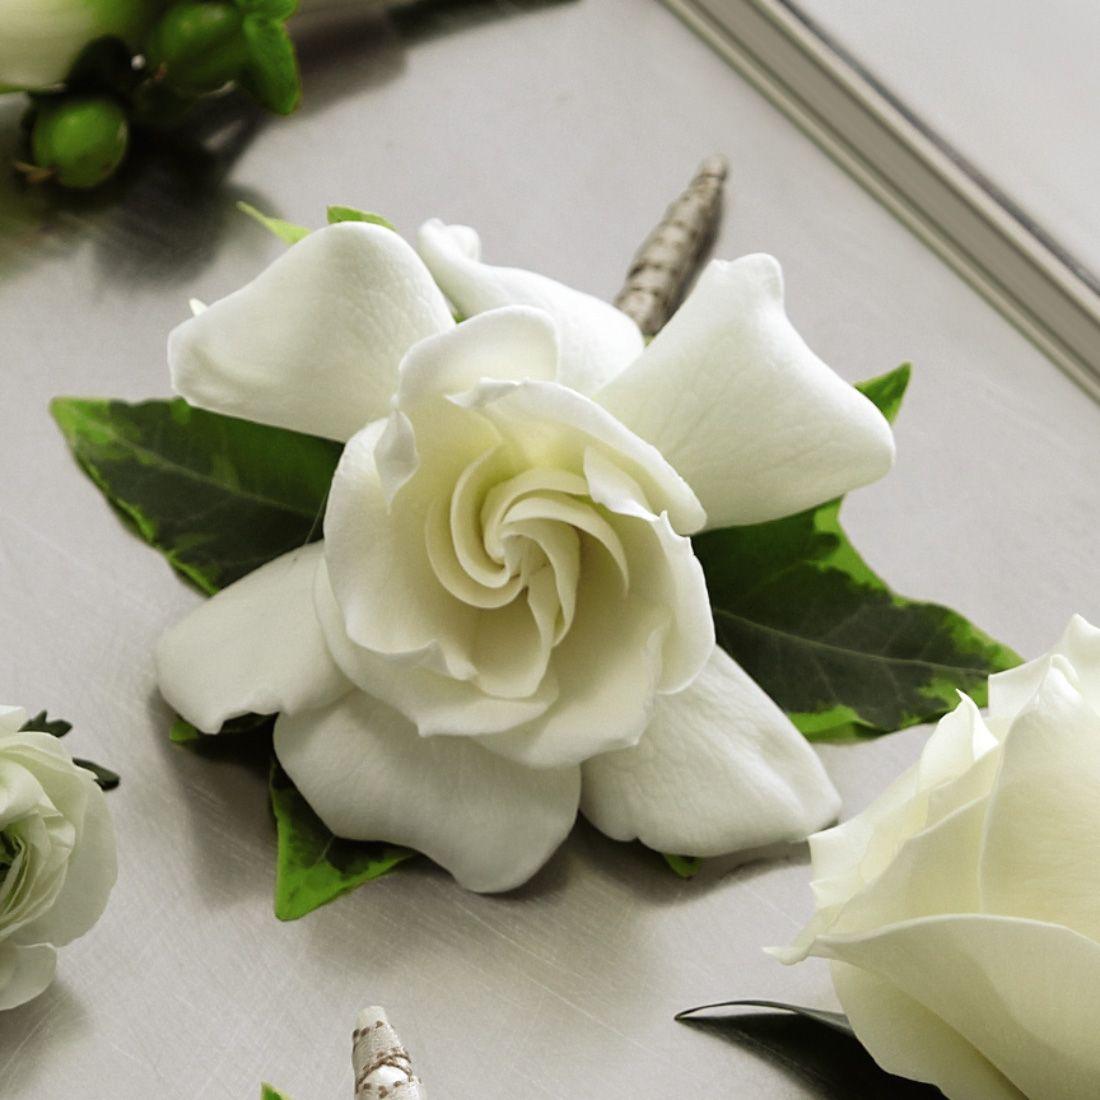 The Ftd Gardenia Boutonniere Gardenia Flower Delivery